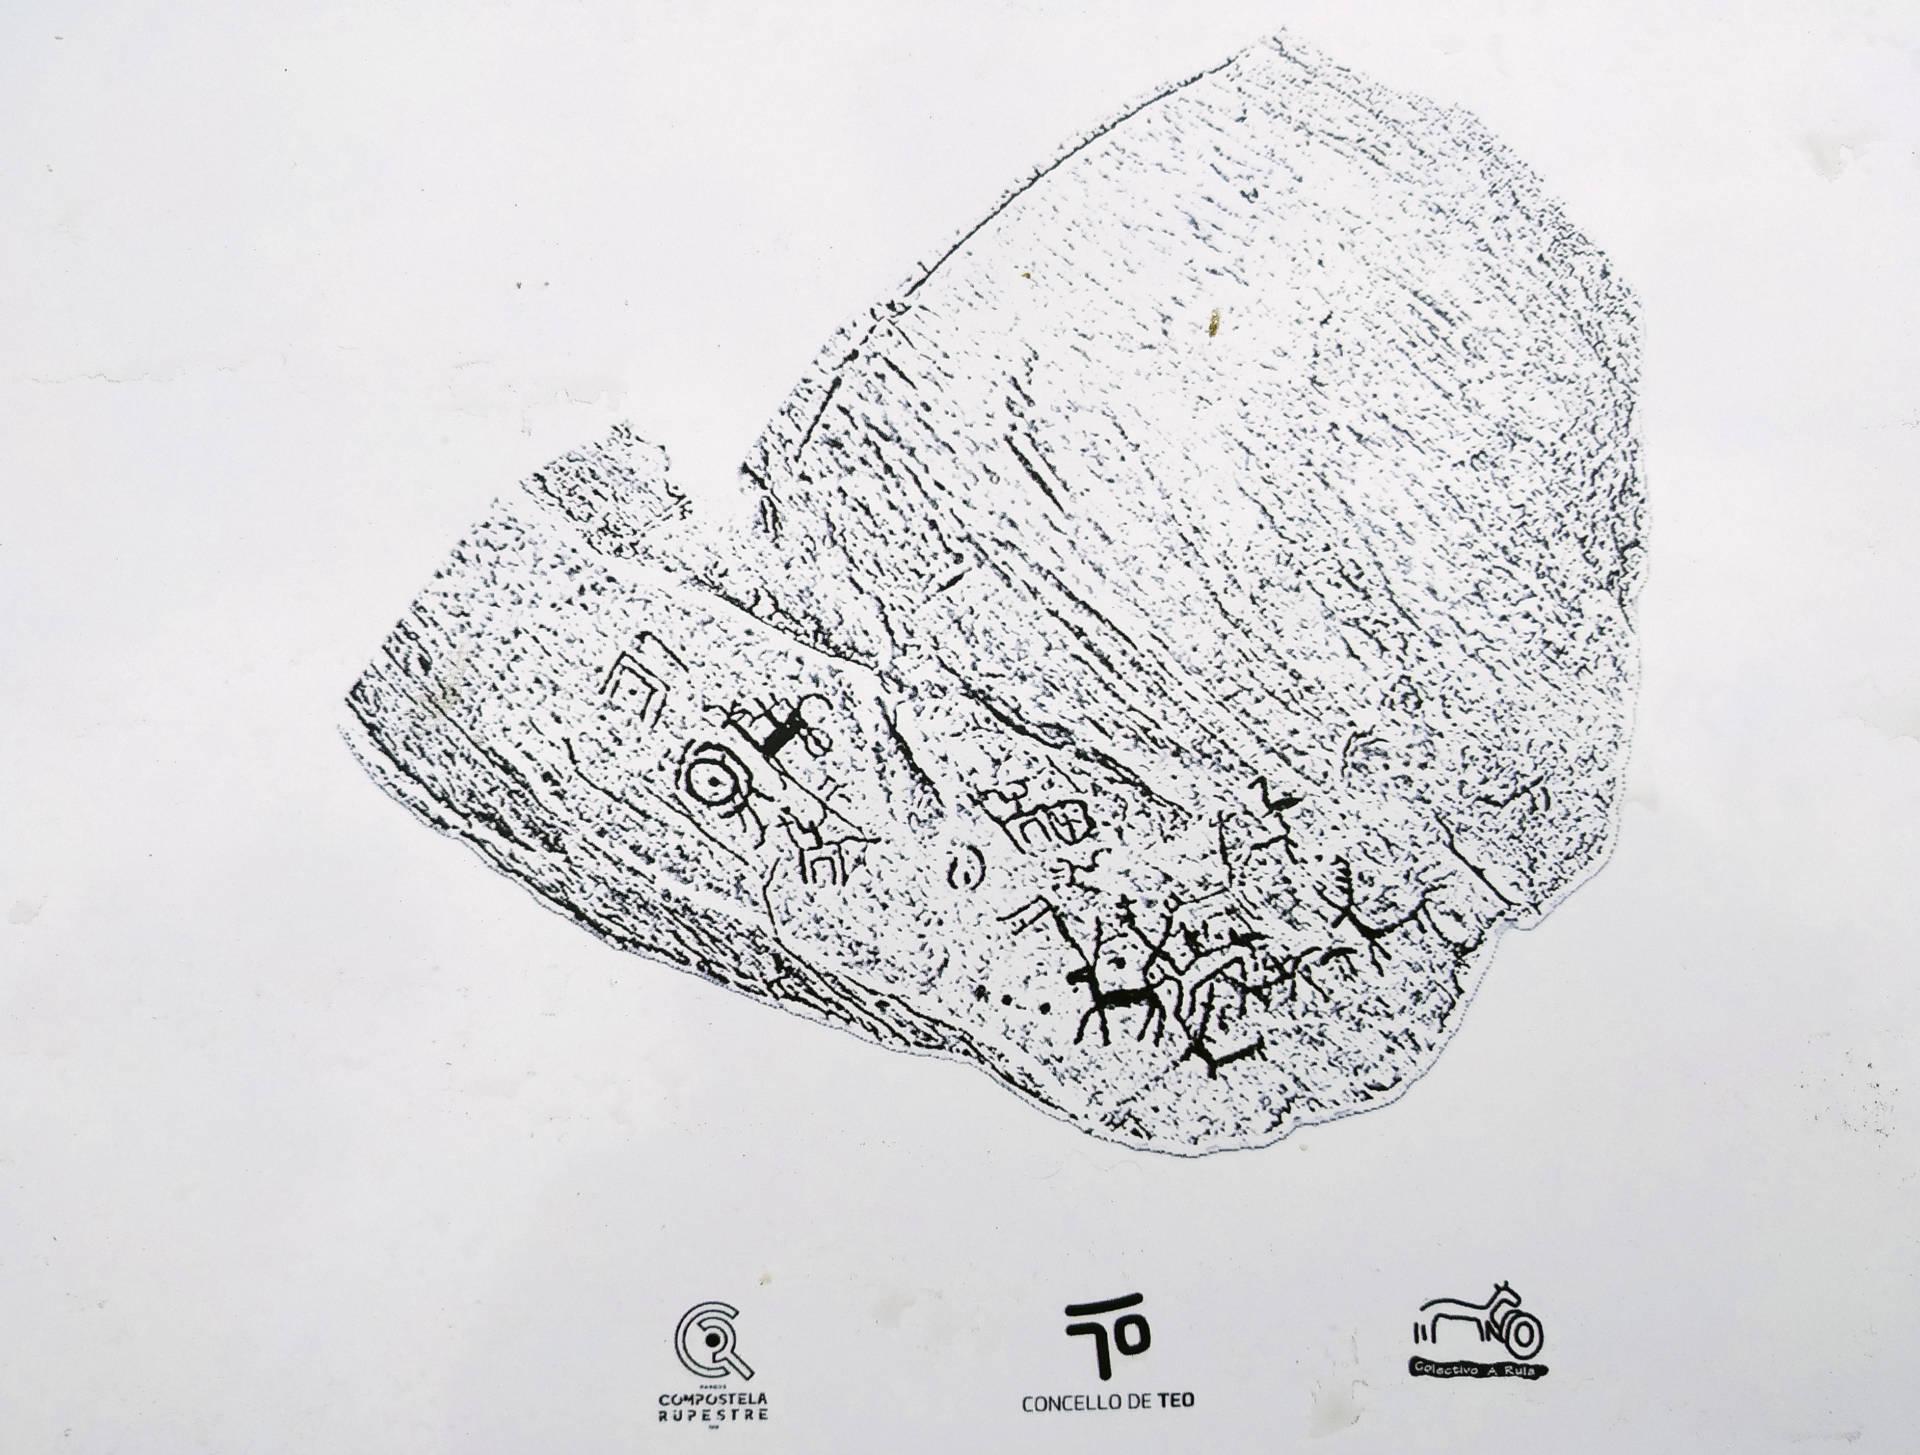 Calco del petroglifo de Río Angueira 2.